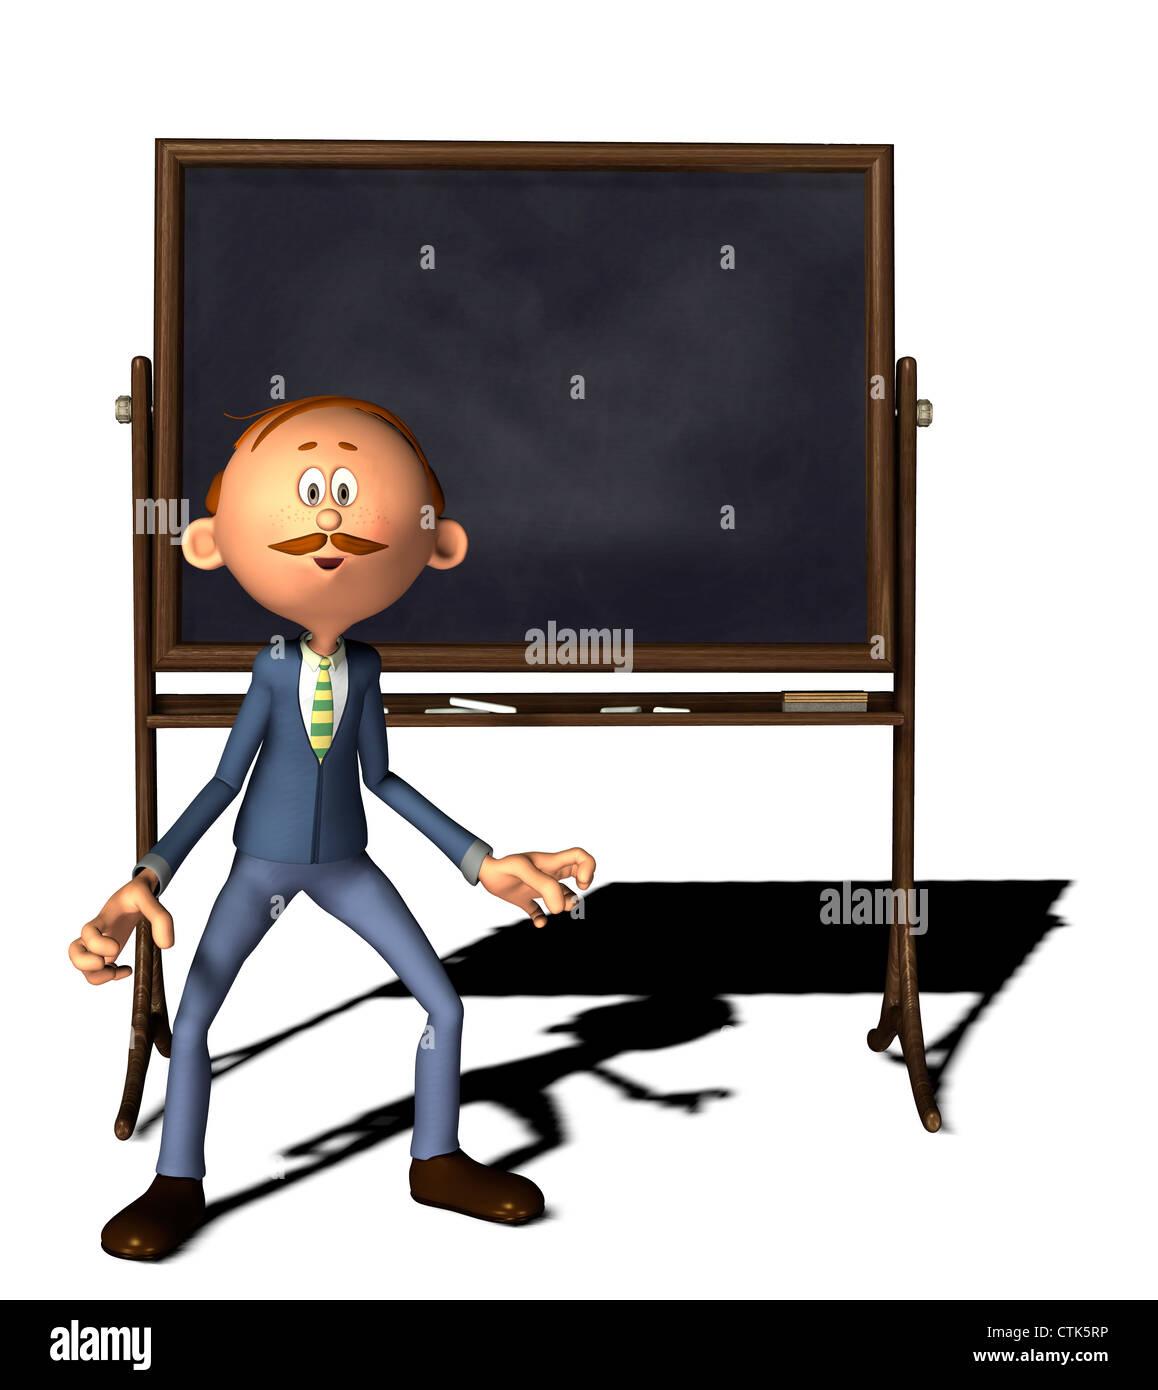 Cartoonfigur Lehrer mit Tafel / cartoon figure teacher with board Stock Photo